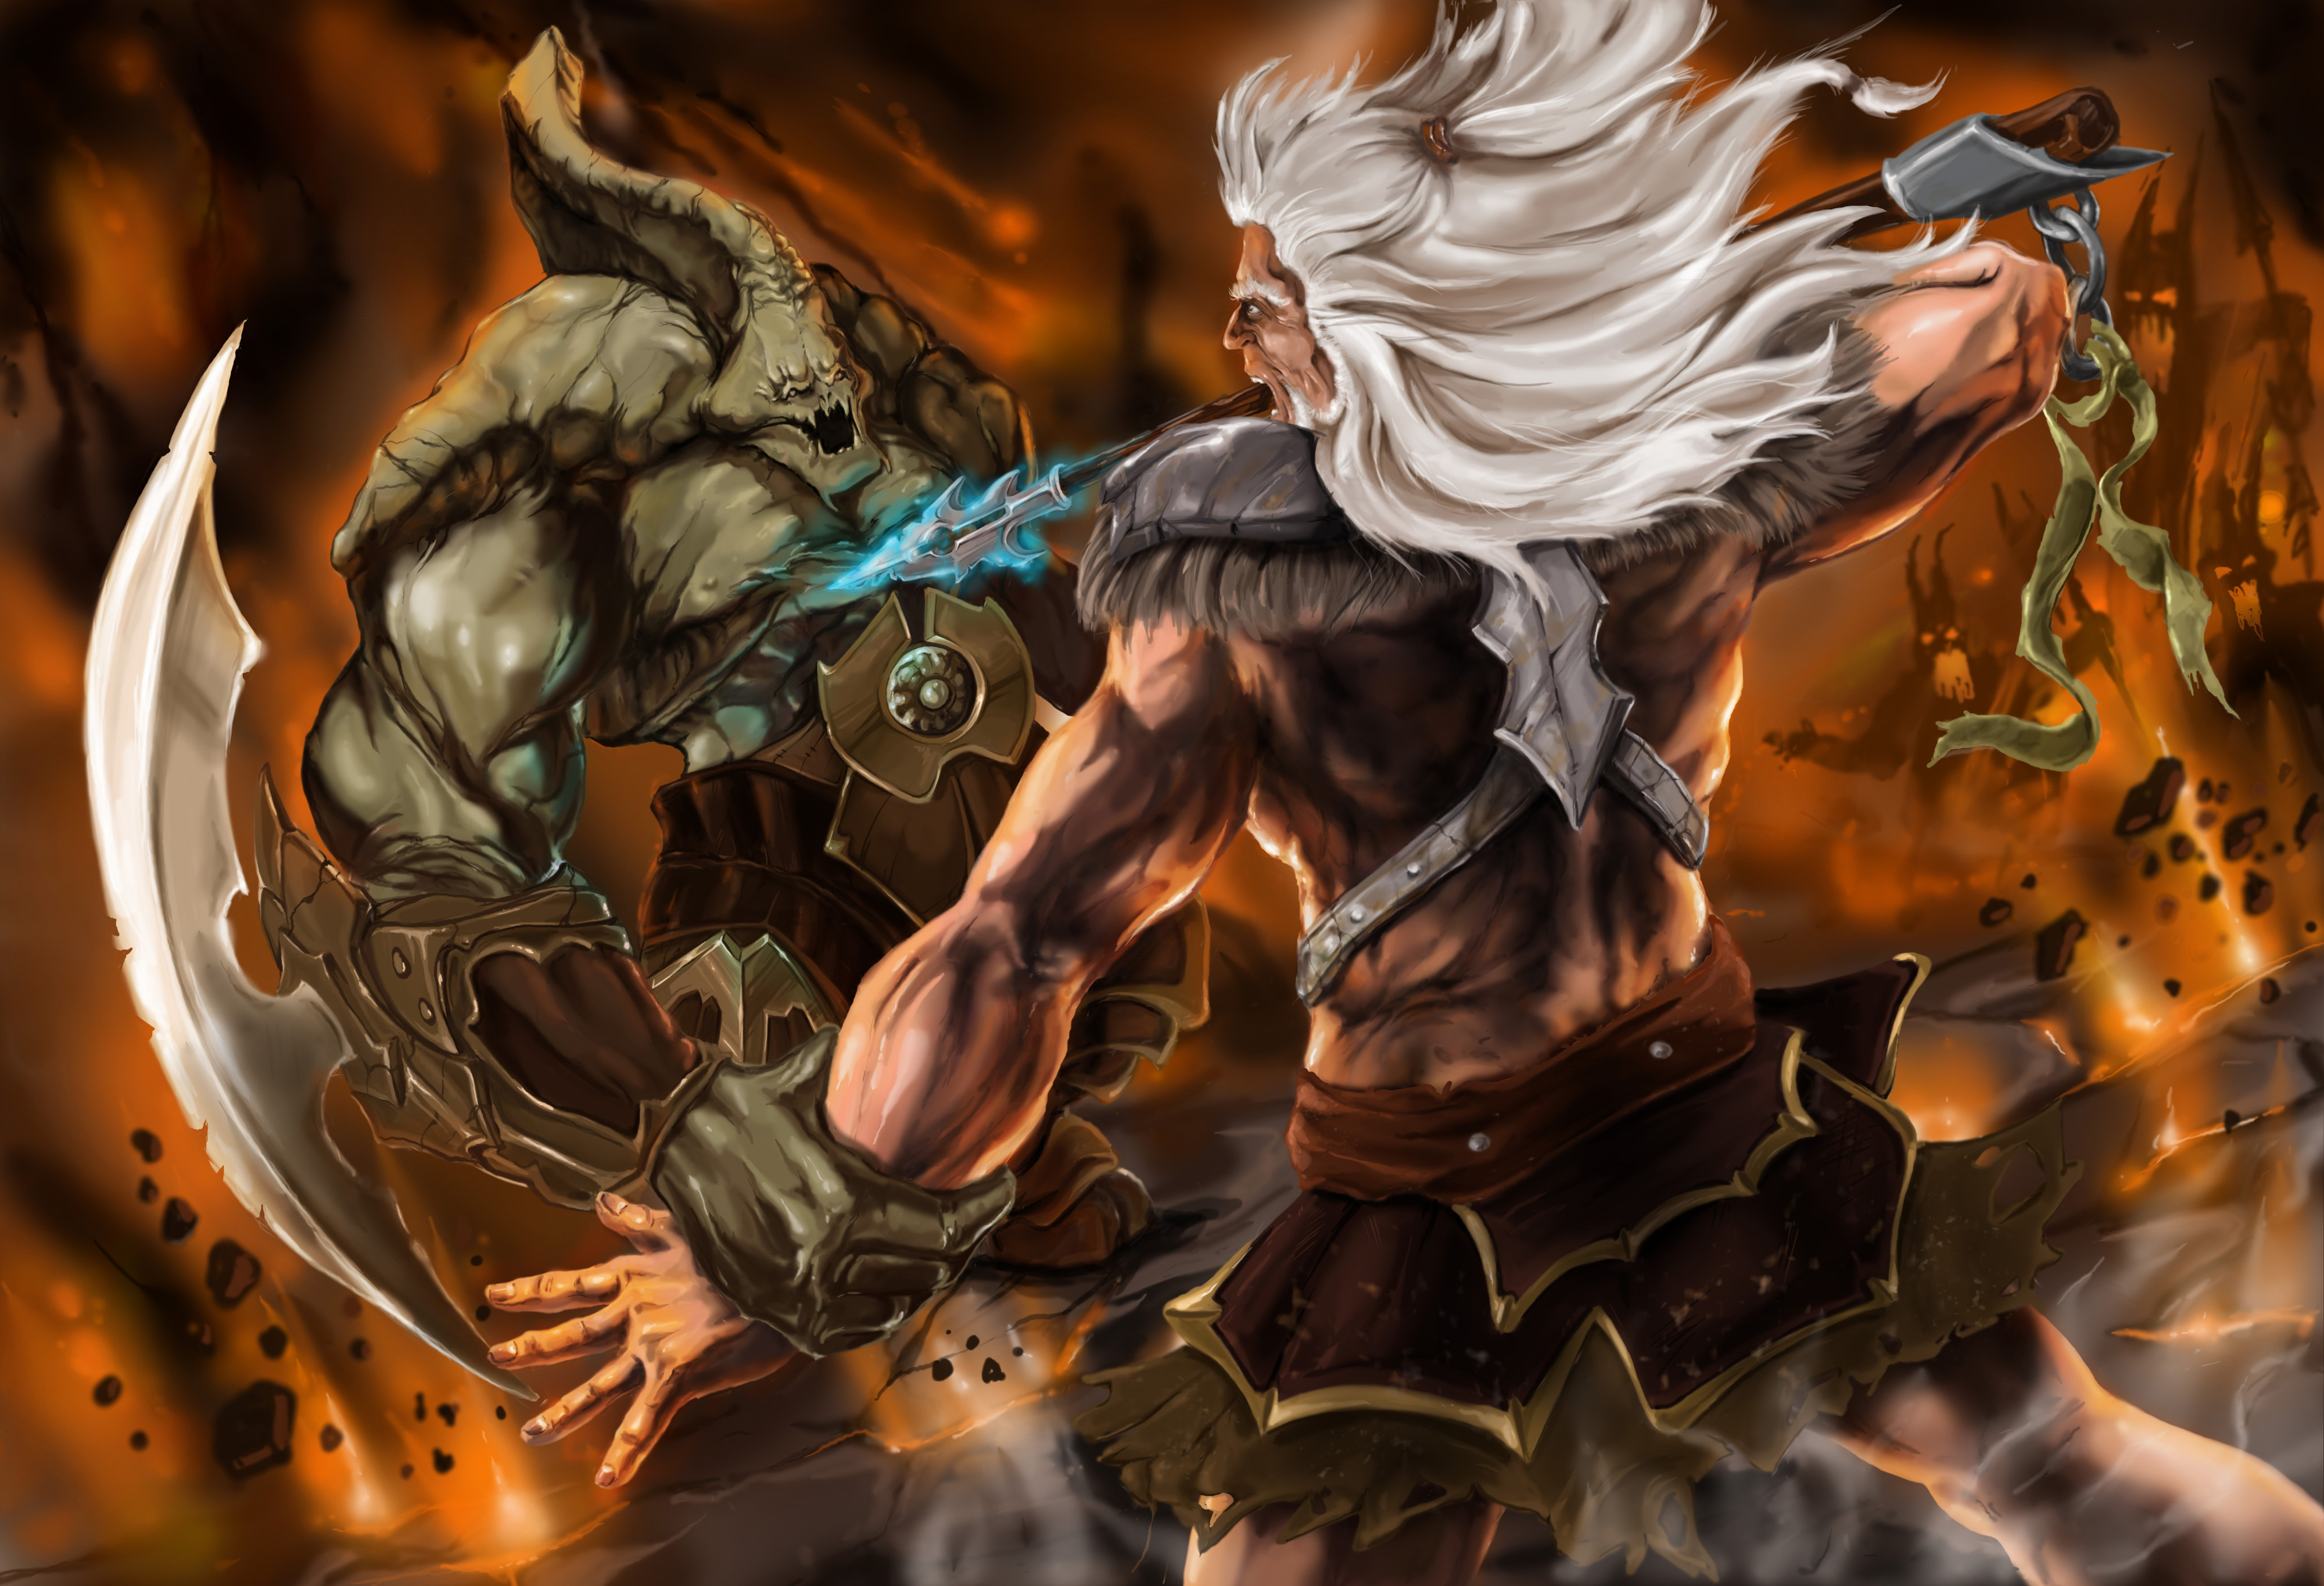 Diablo 3 Ros Wallpaper: Diablo III 4k Ultra HD Wallpaper And Background Image